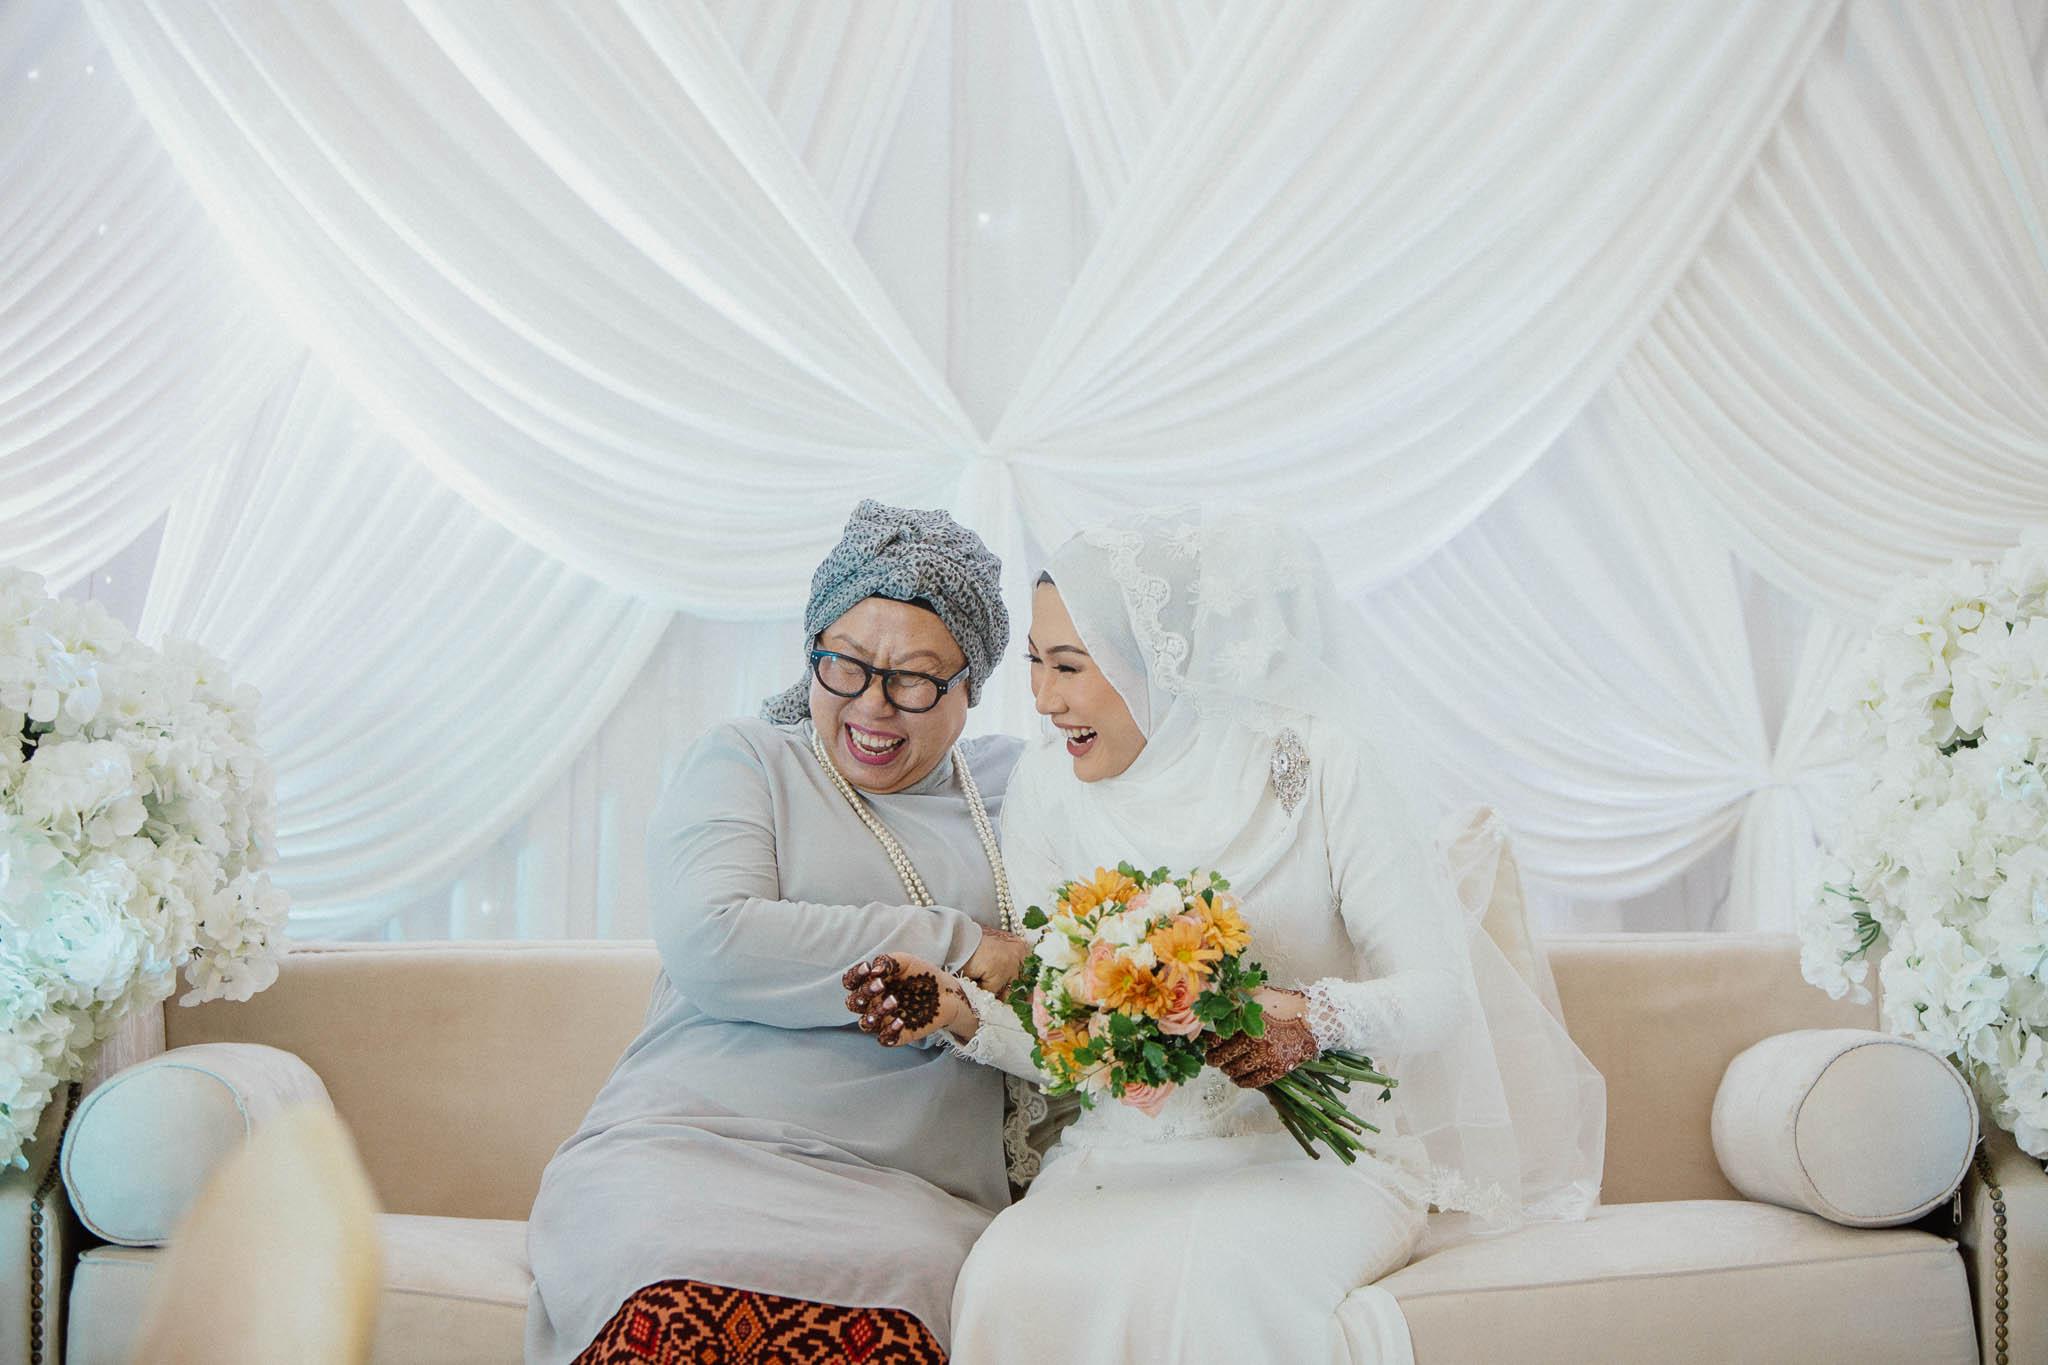 singapore-wedding-photographer-addafiq-nufail-019.jpg